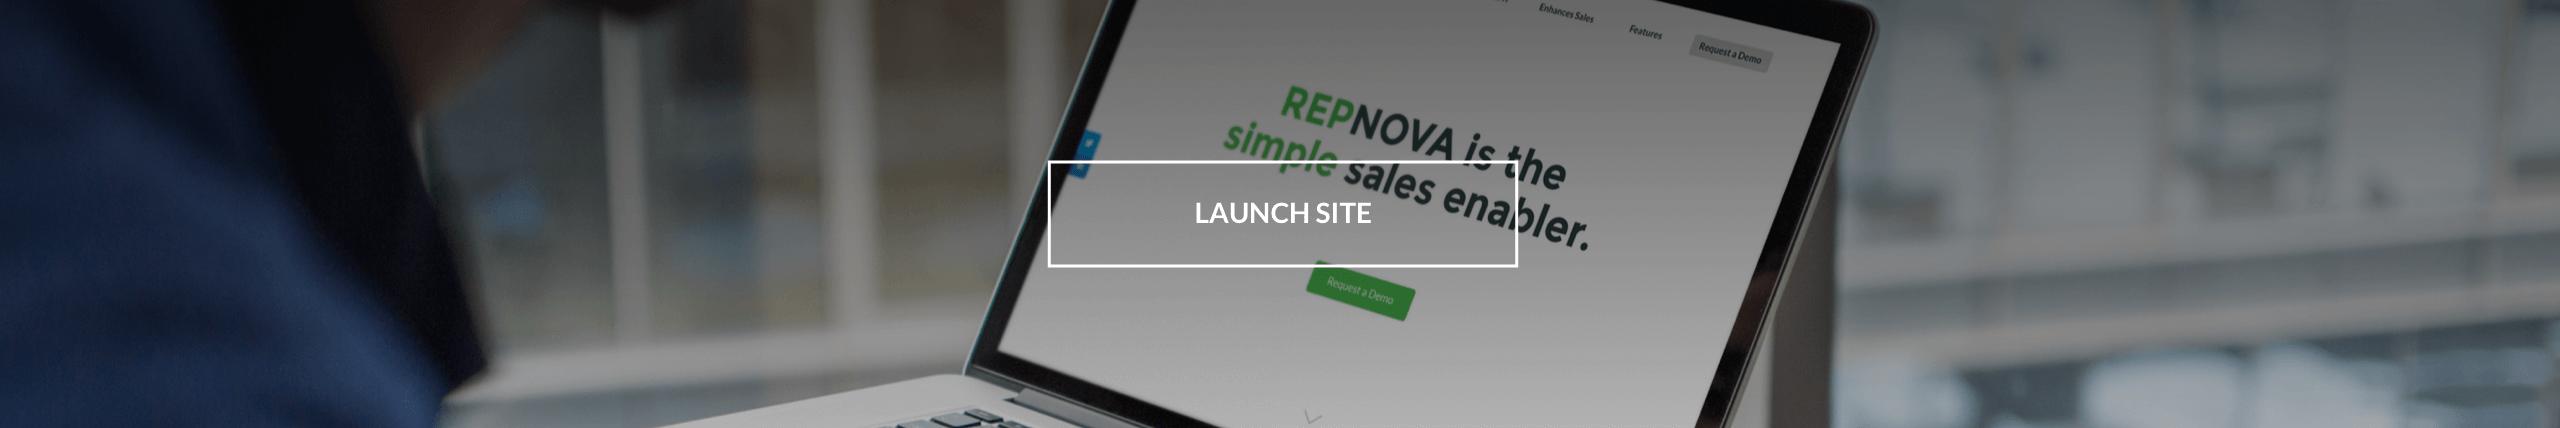 launchsite_repnova